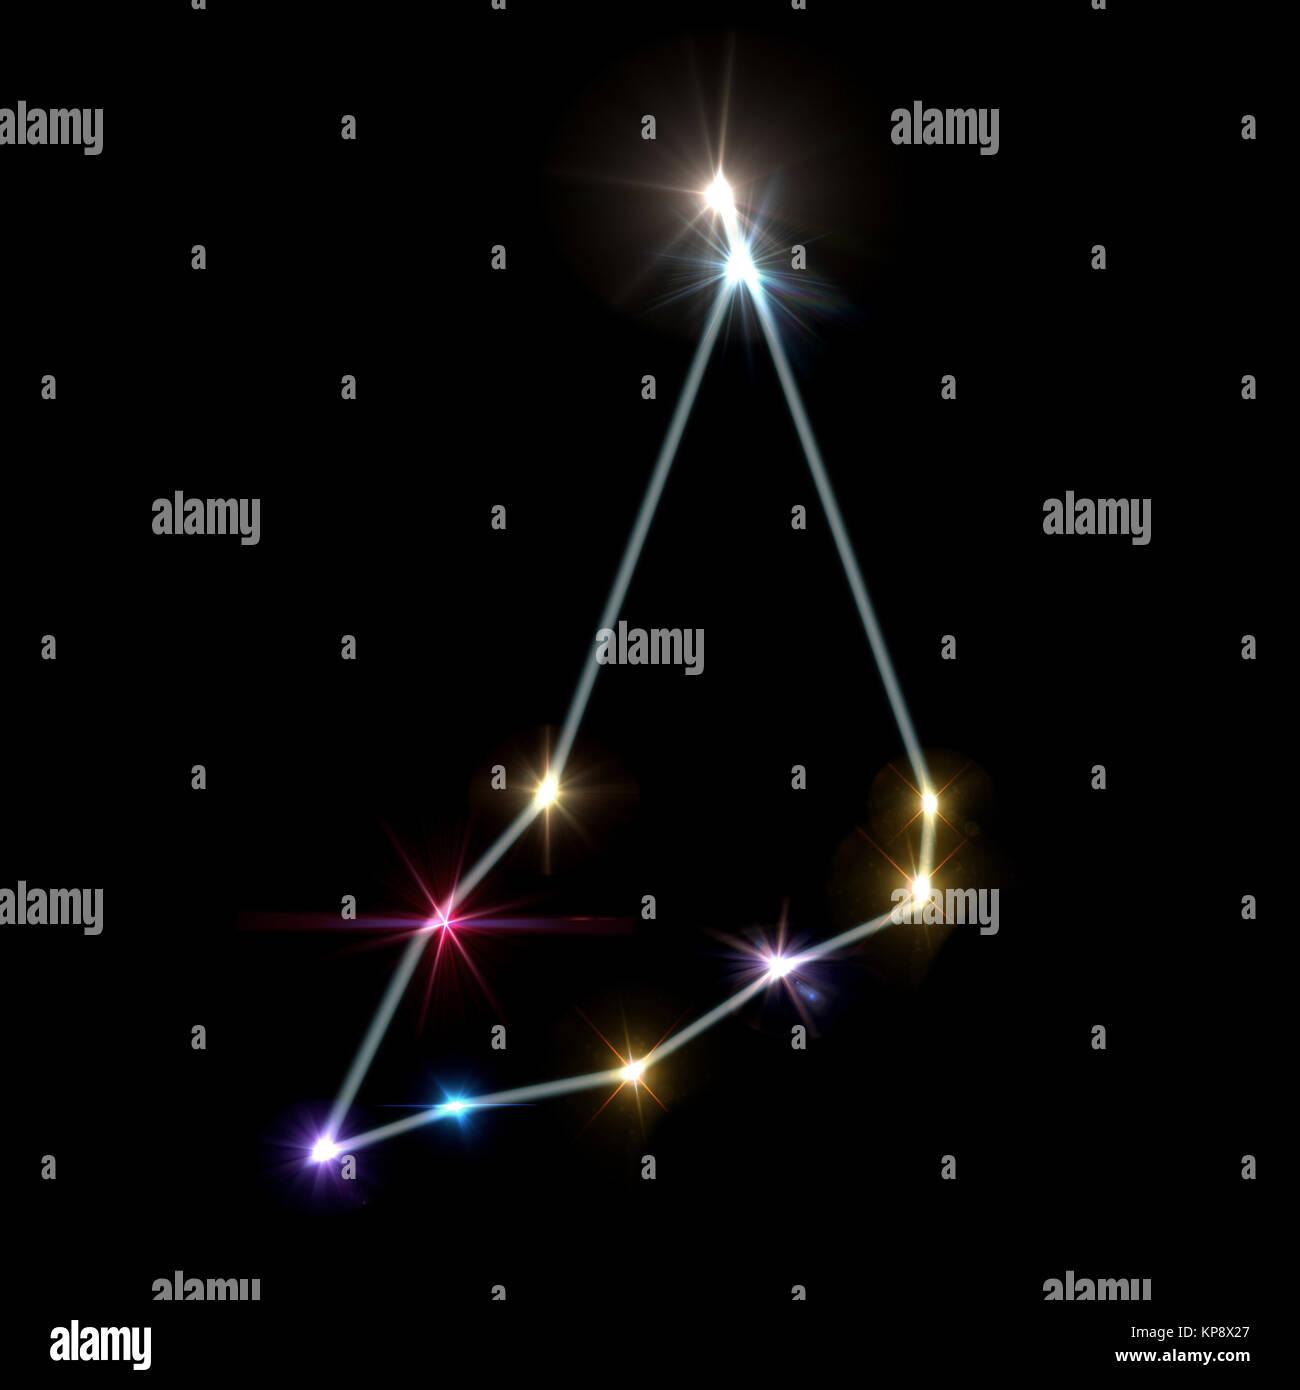 Zodiac Chart Stock Photos & Zodiac Chart Stock Images - Alamy